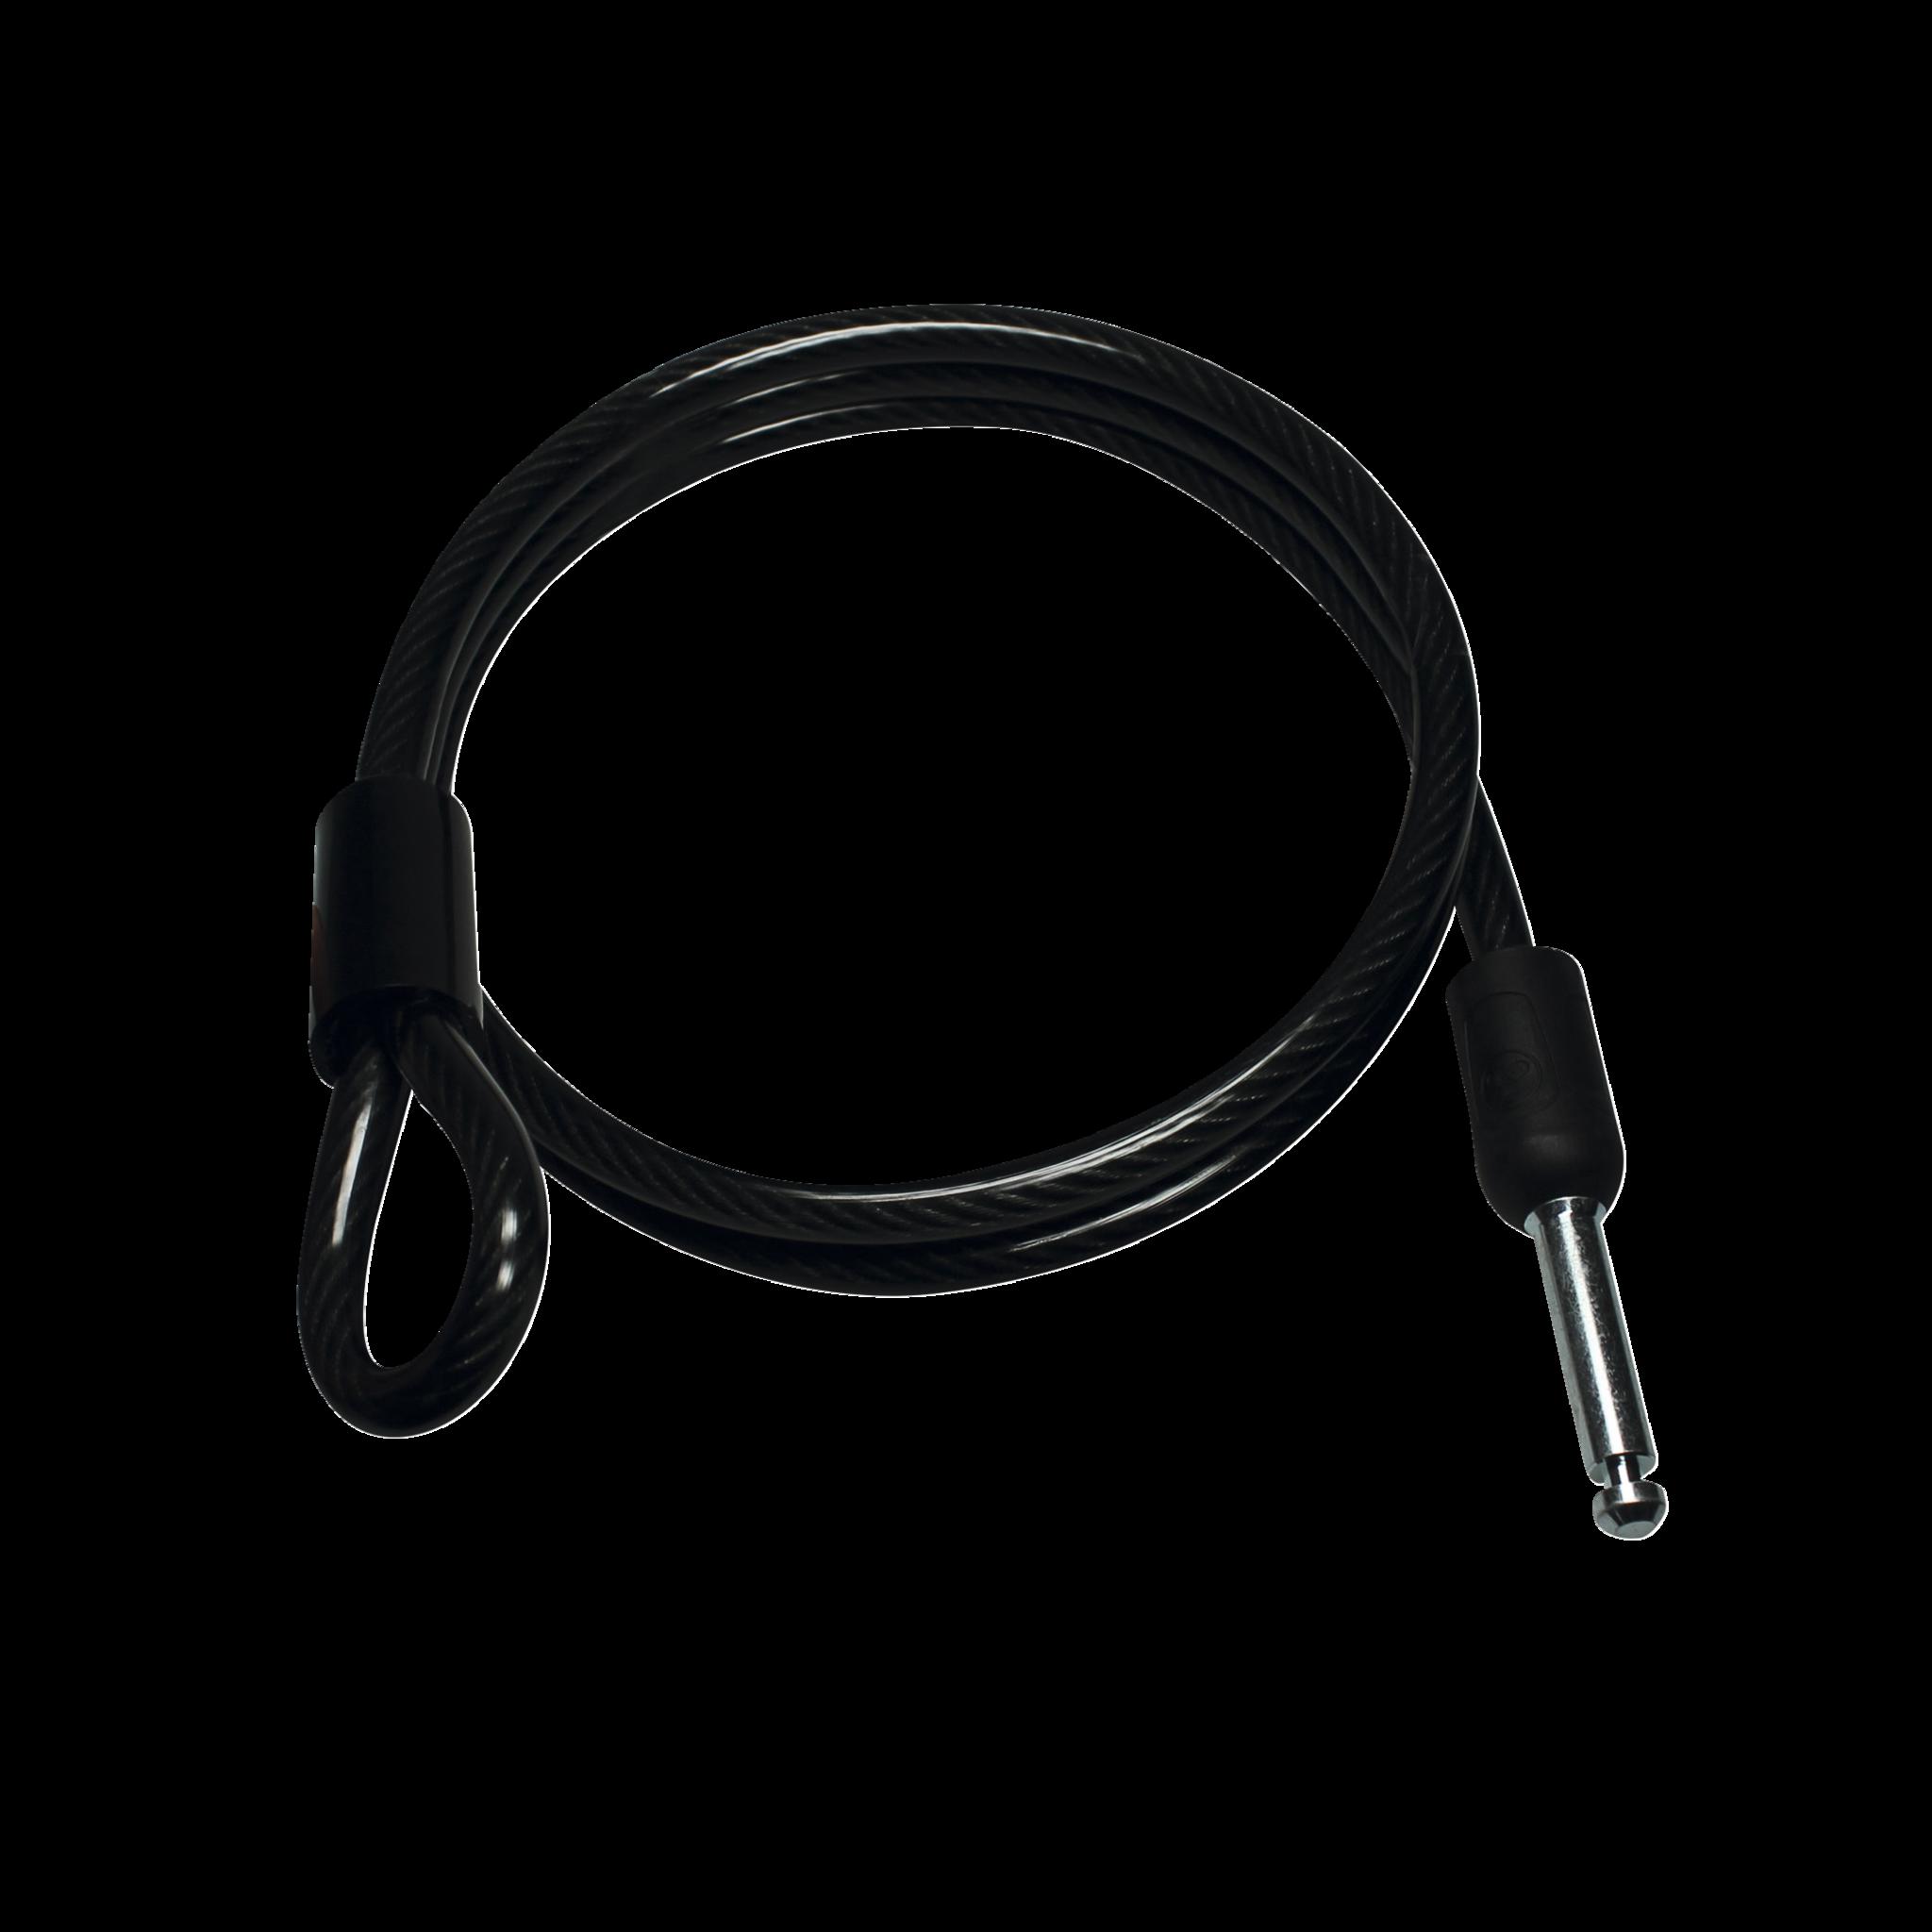 ZR 310 POC wire for framelock, wire til cykellås, black | Bike locks